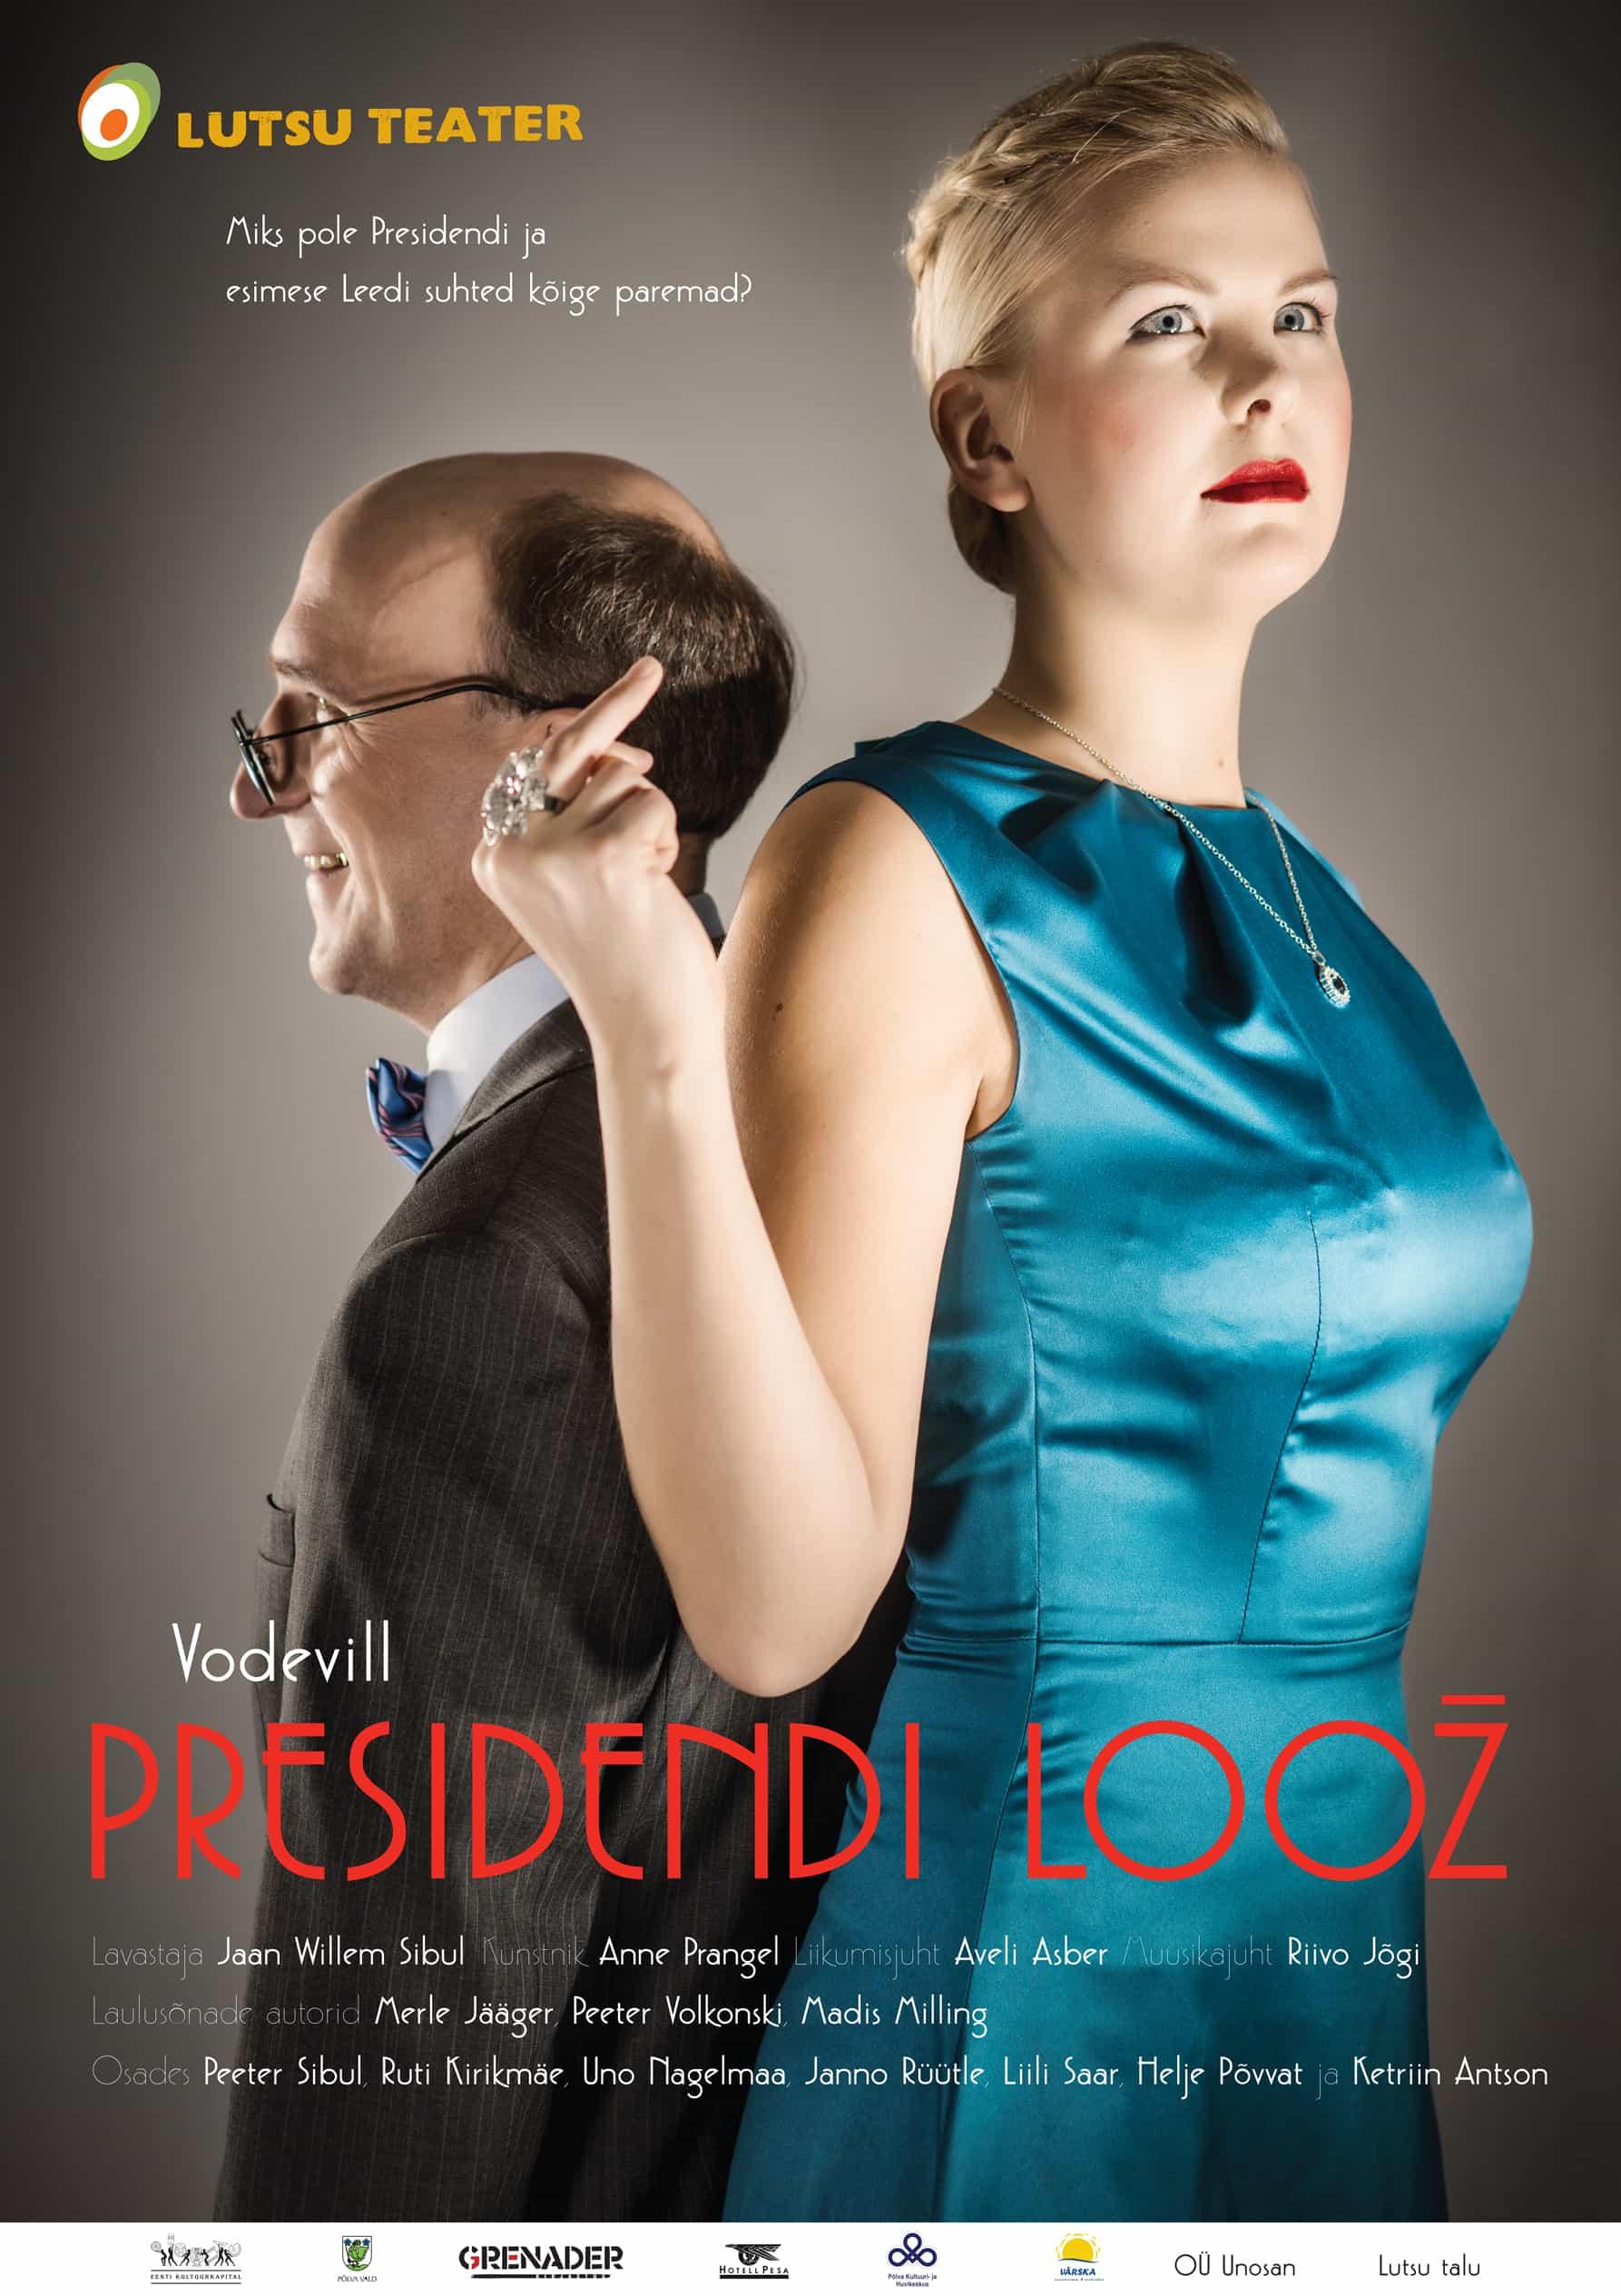 presidendi-looz-valmis